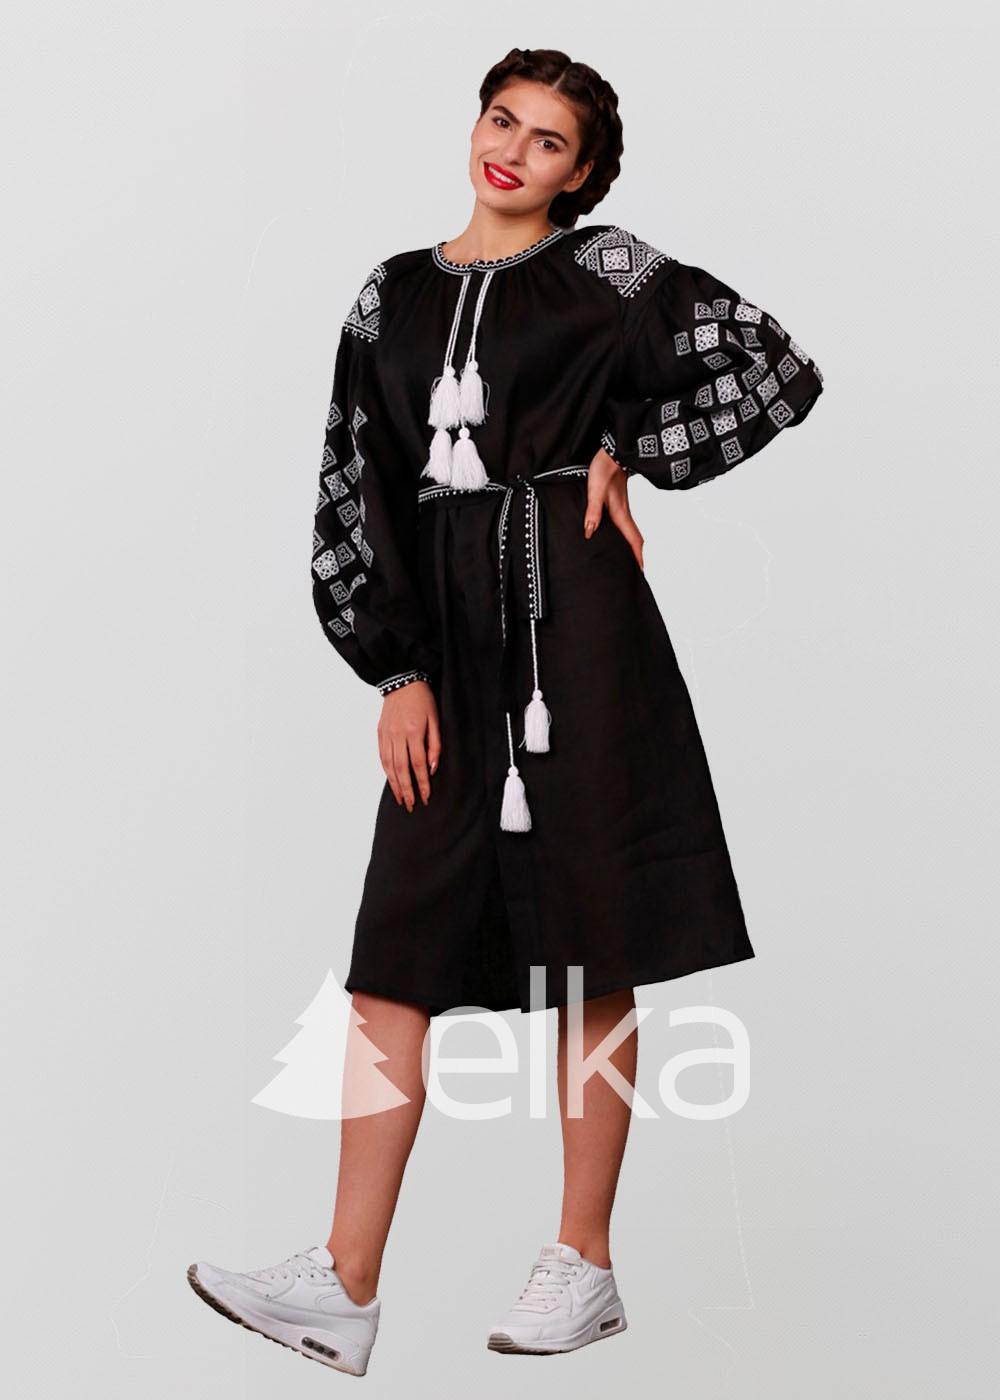 Платье вышиванка Окошко